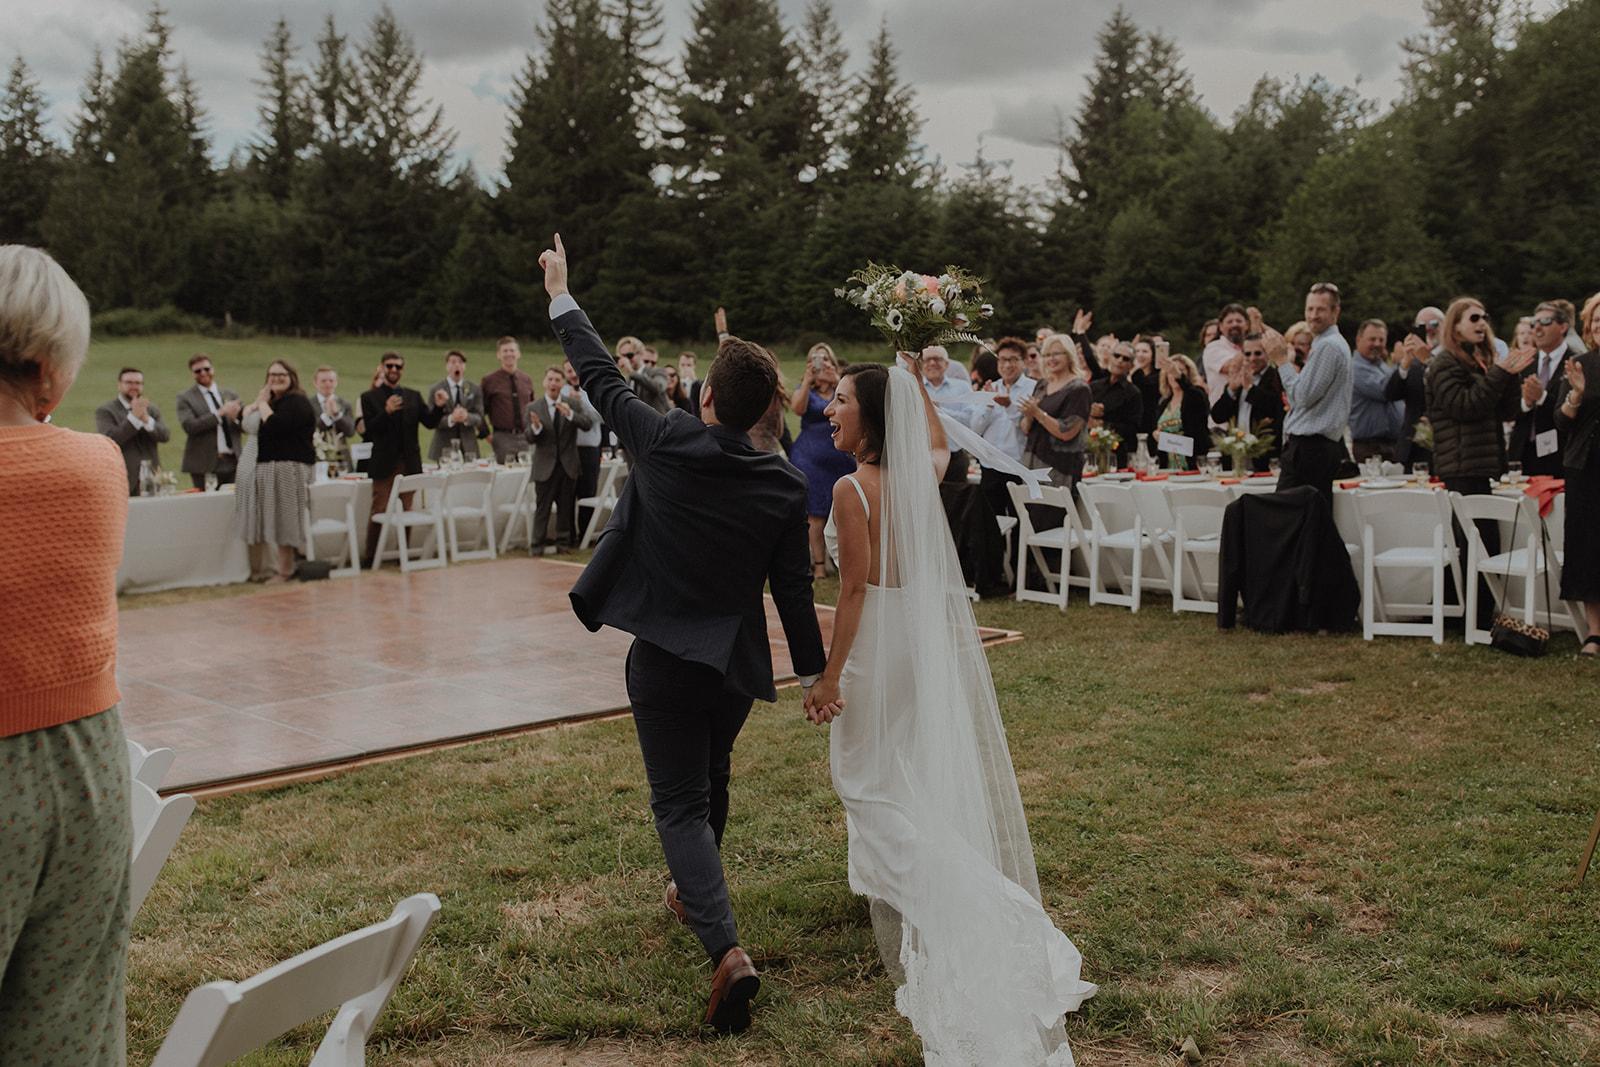 cortney_skye_wedding_june2019-534.jpg